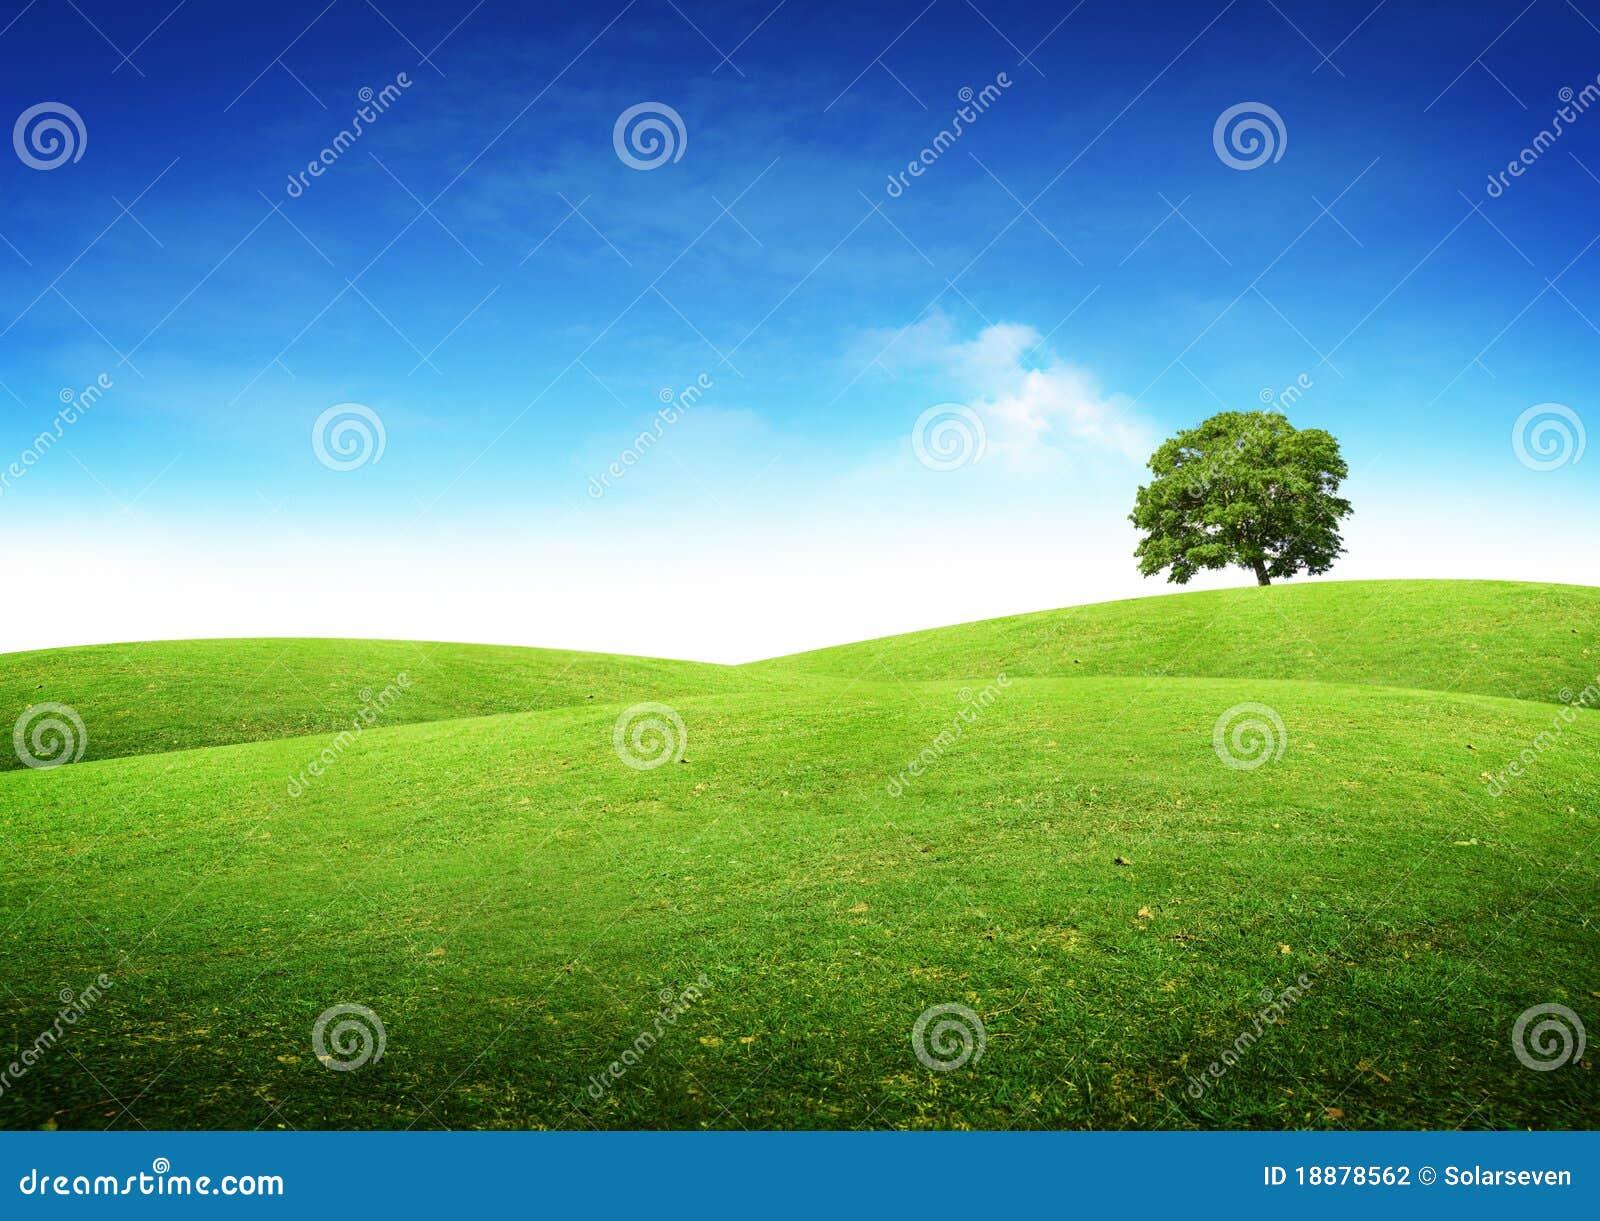 Grüne Sommer-Landschaft